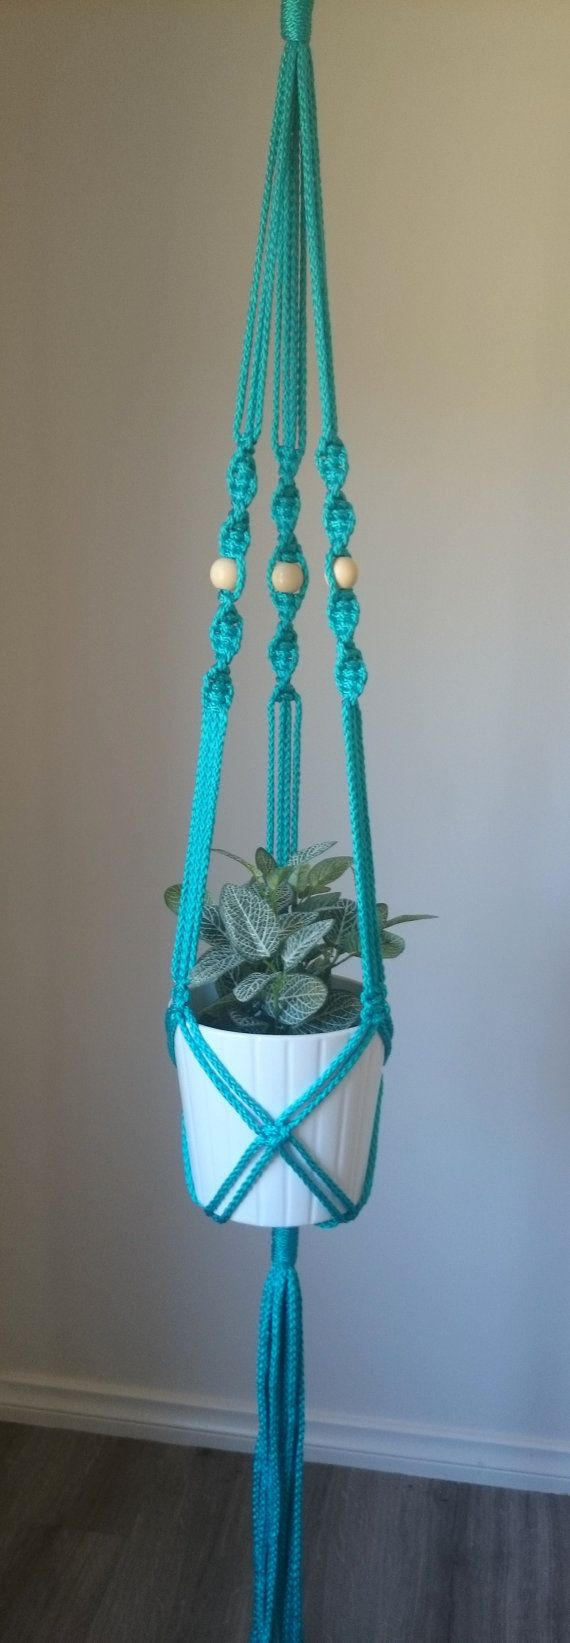 Macrame Pot/Plant Hanger Elwood by TheColouredKnot on Etsy, $40.00